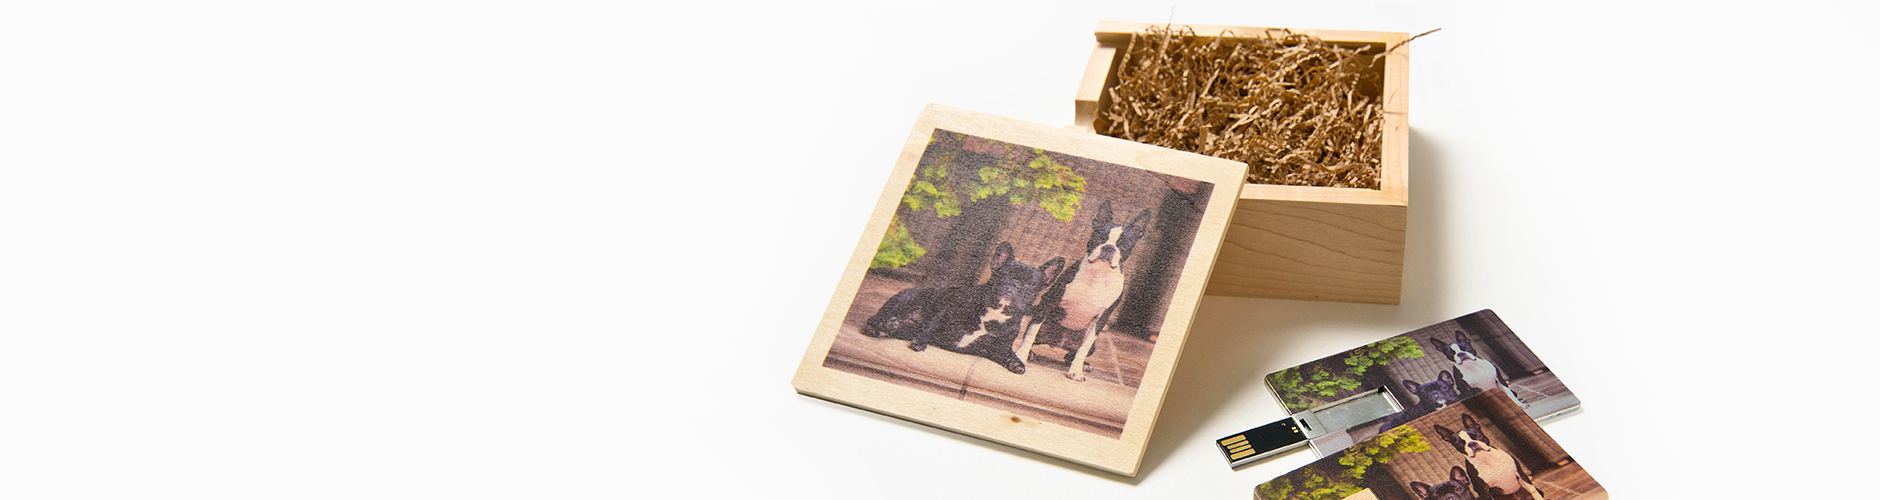 Custom Usb Drives Personalized Photo Usb Drives Wooden